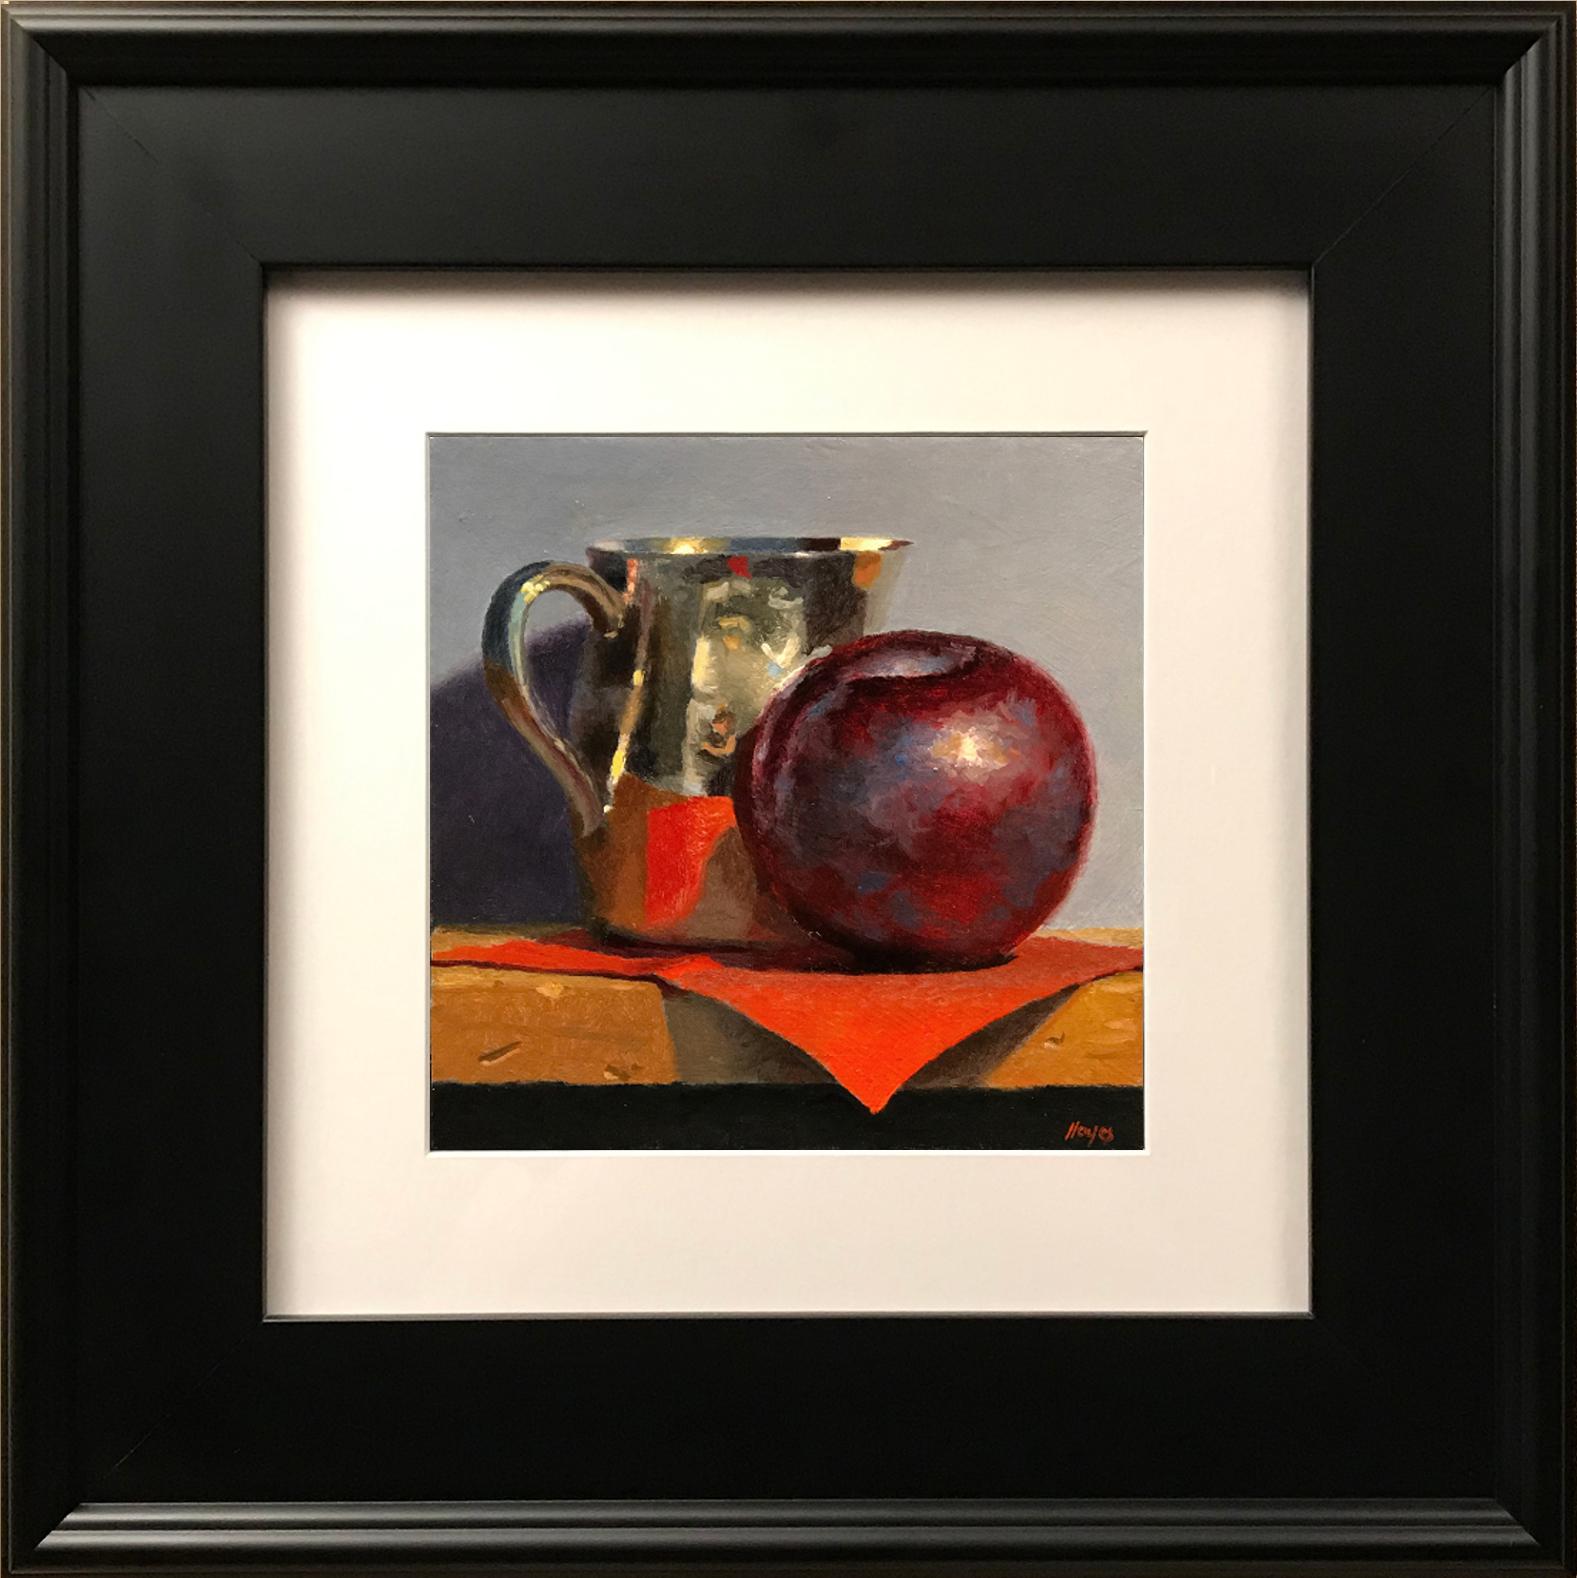 101489-square-print-plein-air-framed-black-cropped